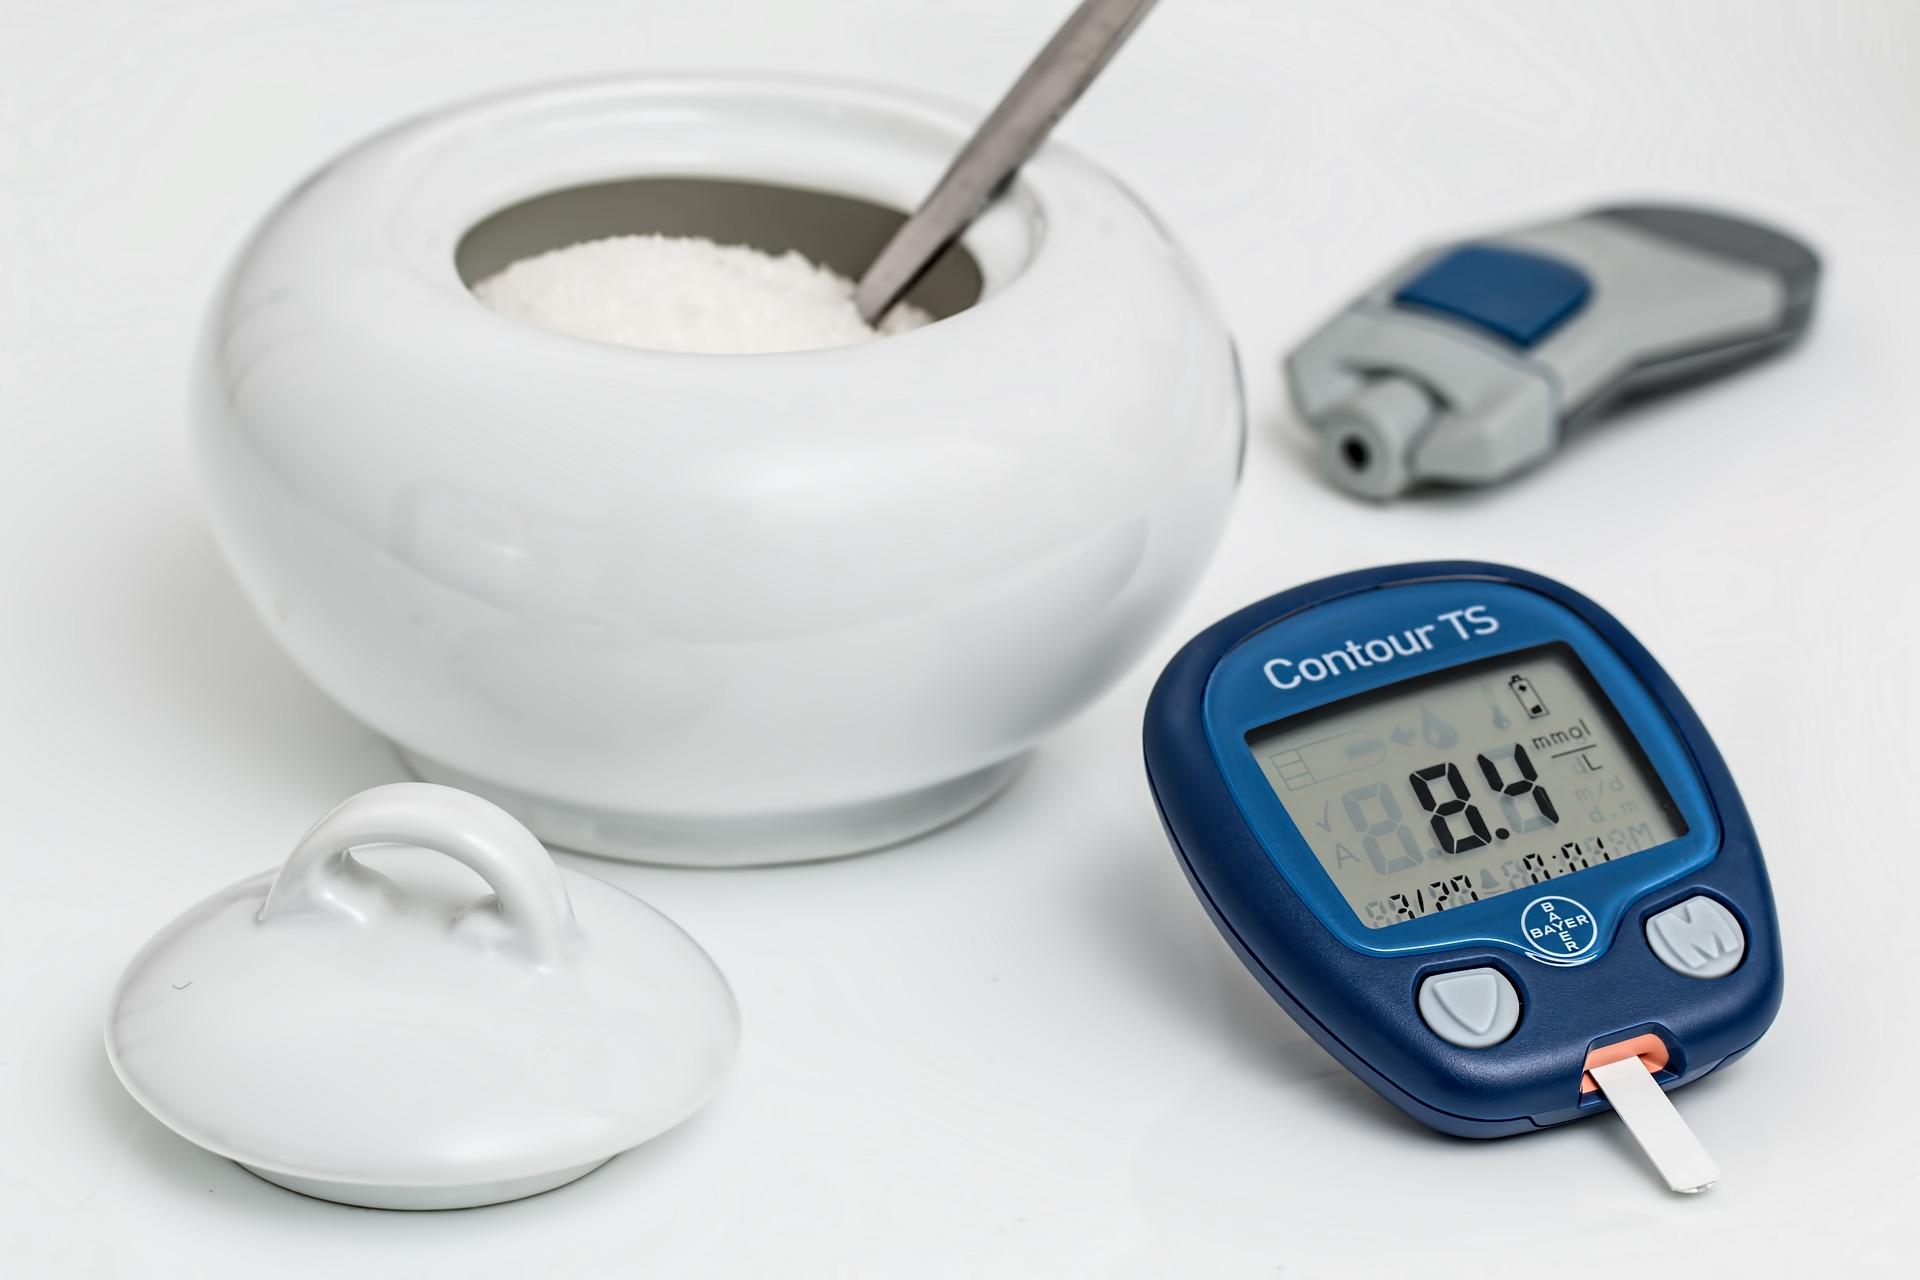 Tips Menjaga Gula Darah Bagi Penderita Diabetes